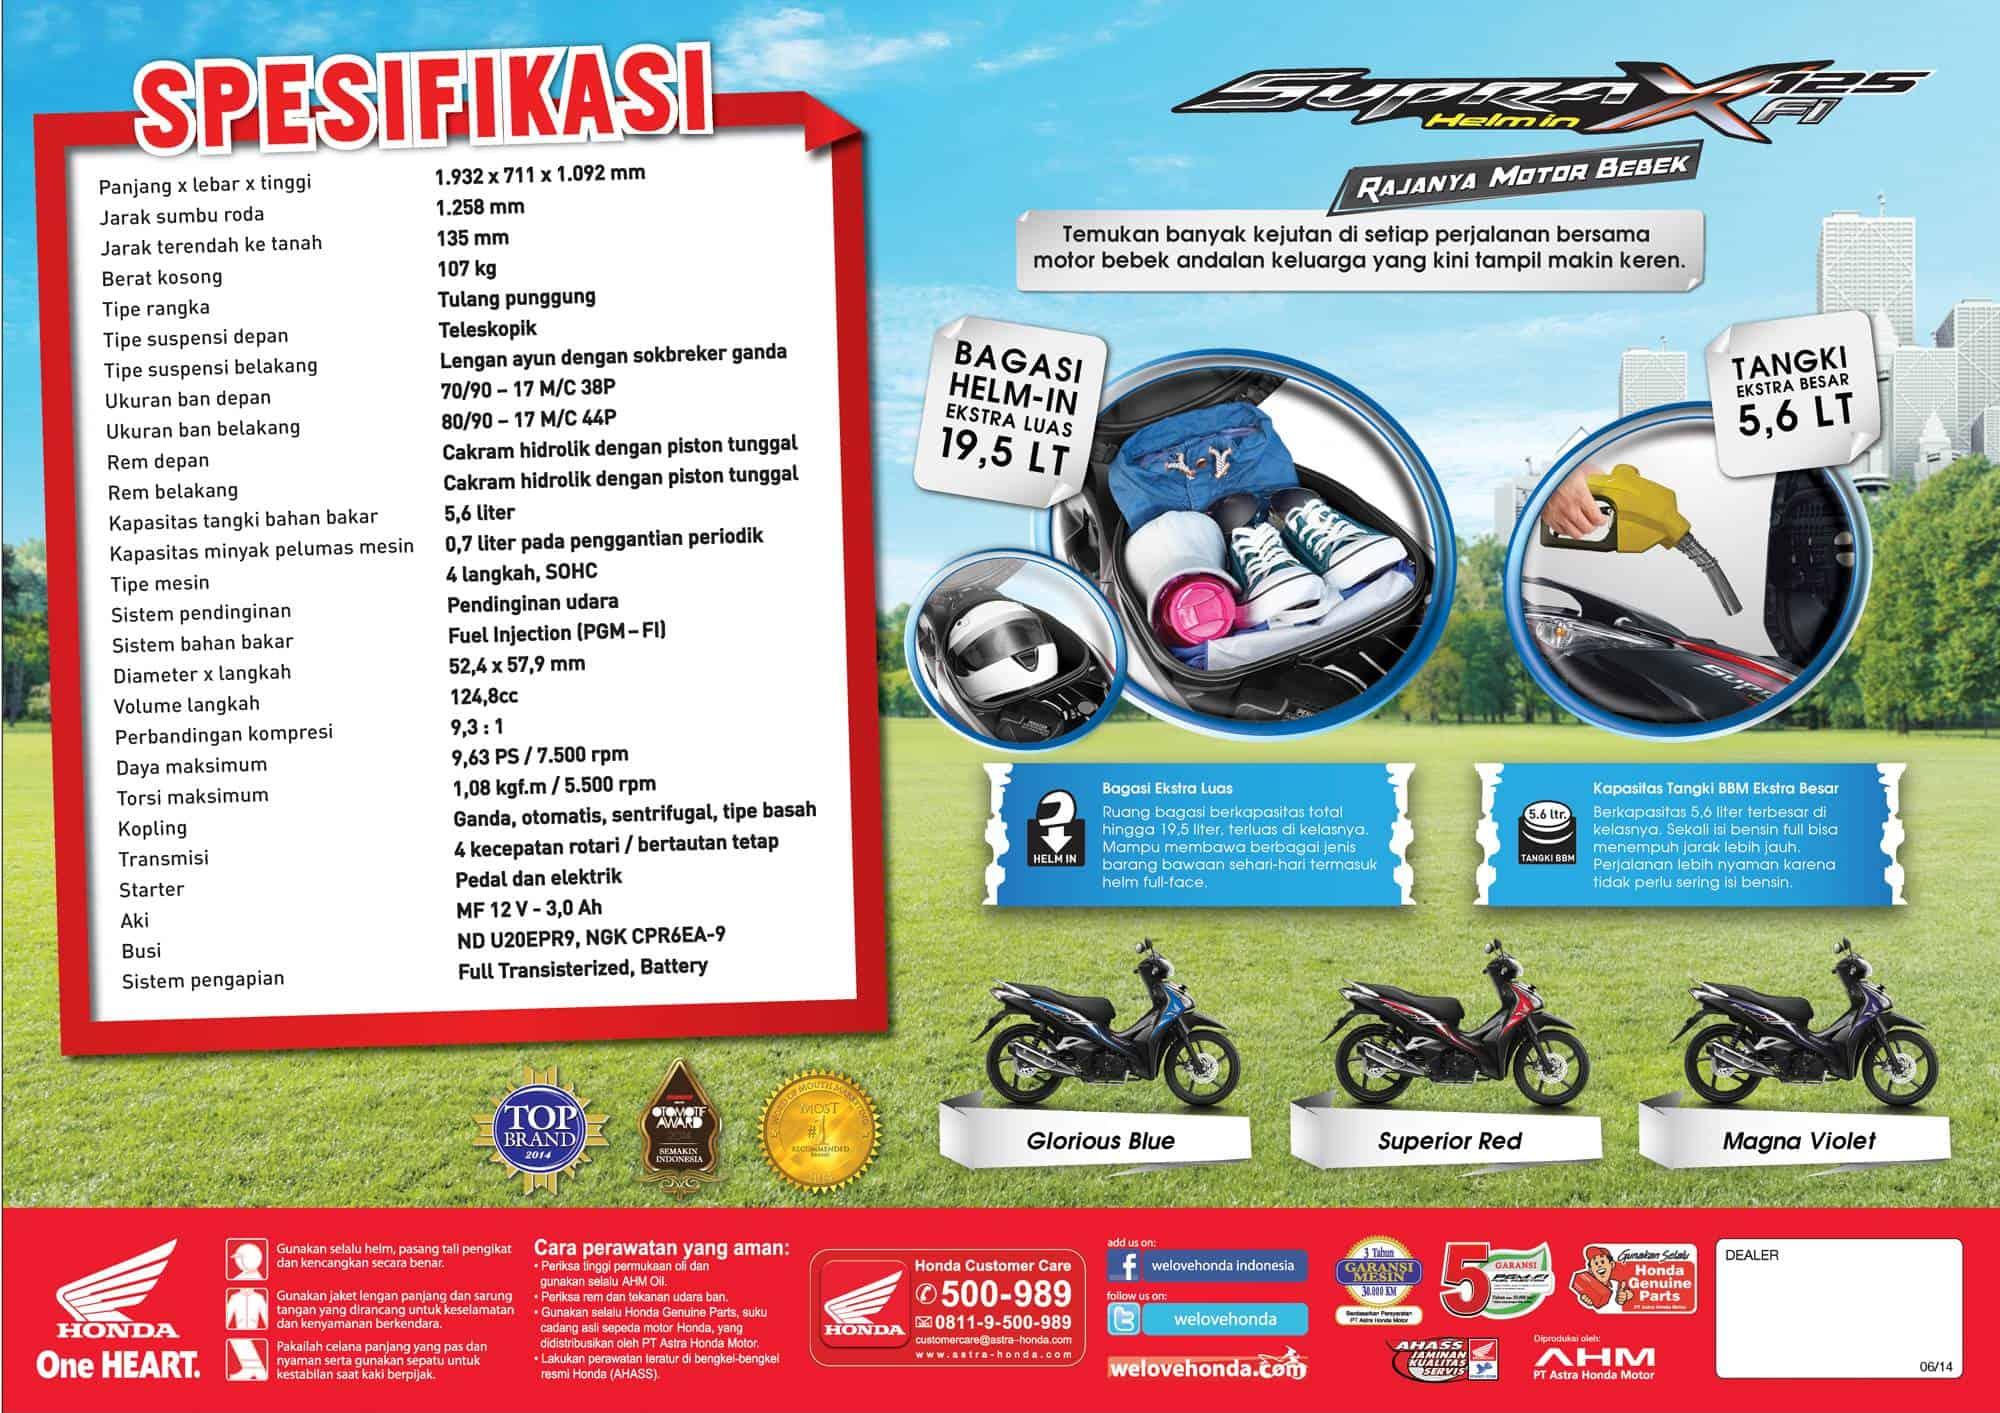 Brosur Motor Honda Supra X 125 Helm-In PGM-FI - 2